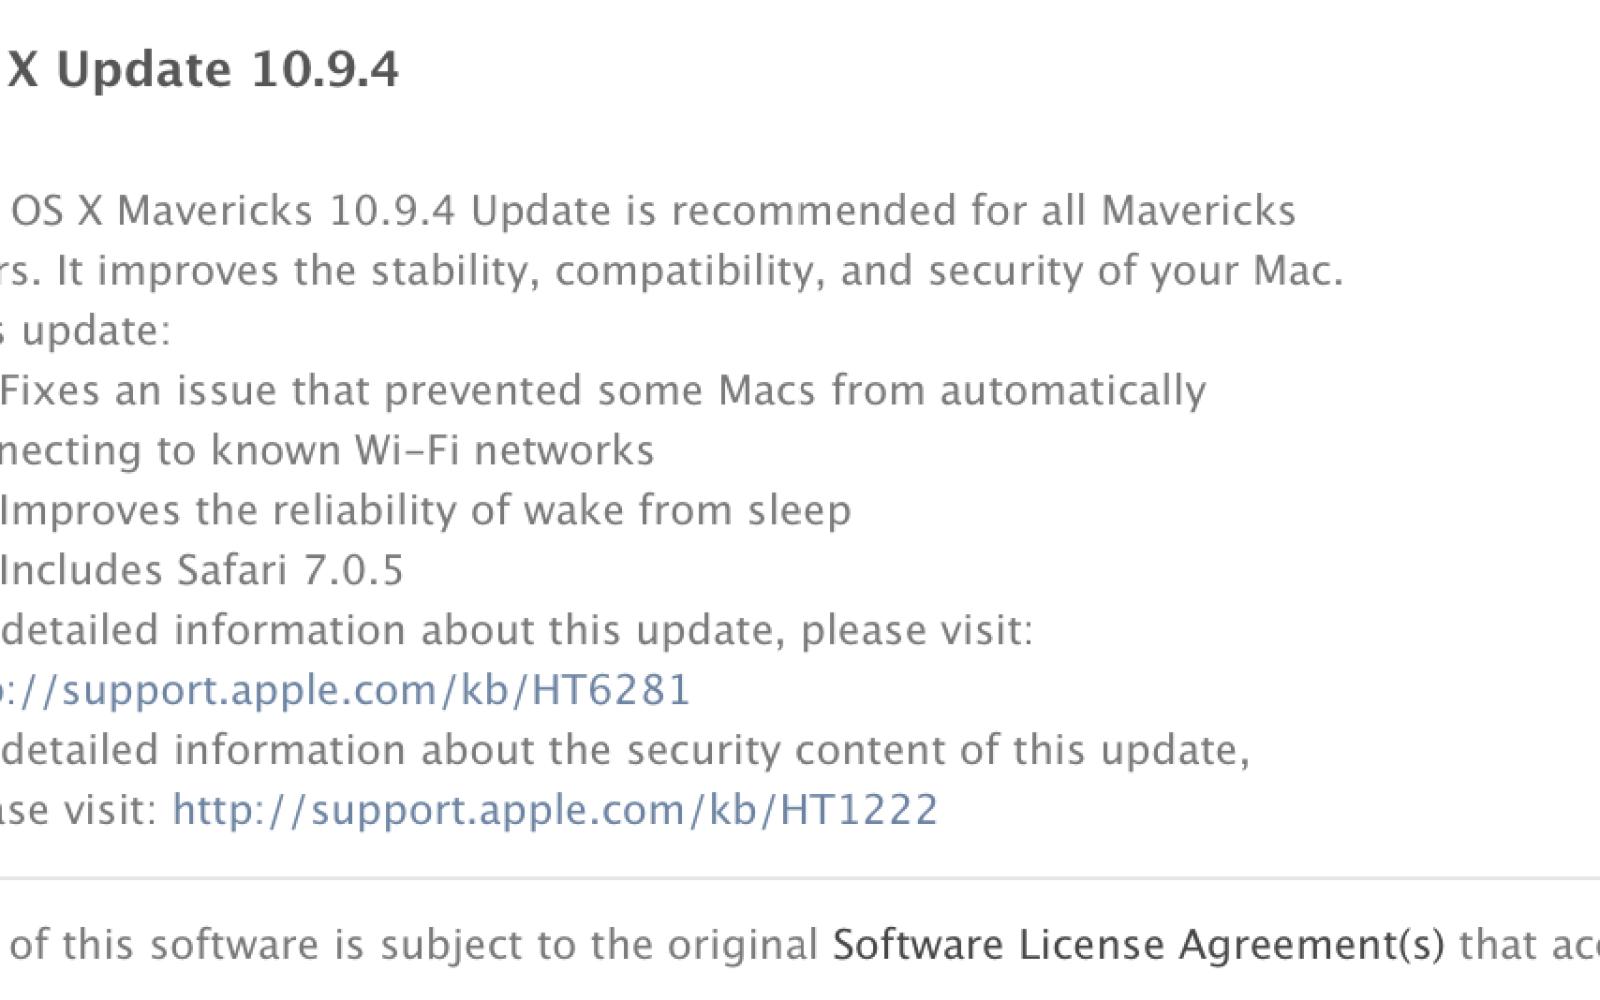 Apple releases OS X 10.9.4 with WiFi & wake-from-sleep fixes, Safari 7.0.5